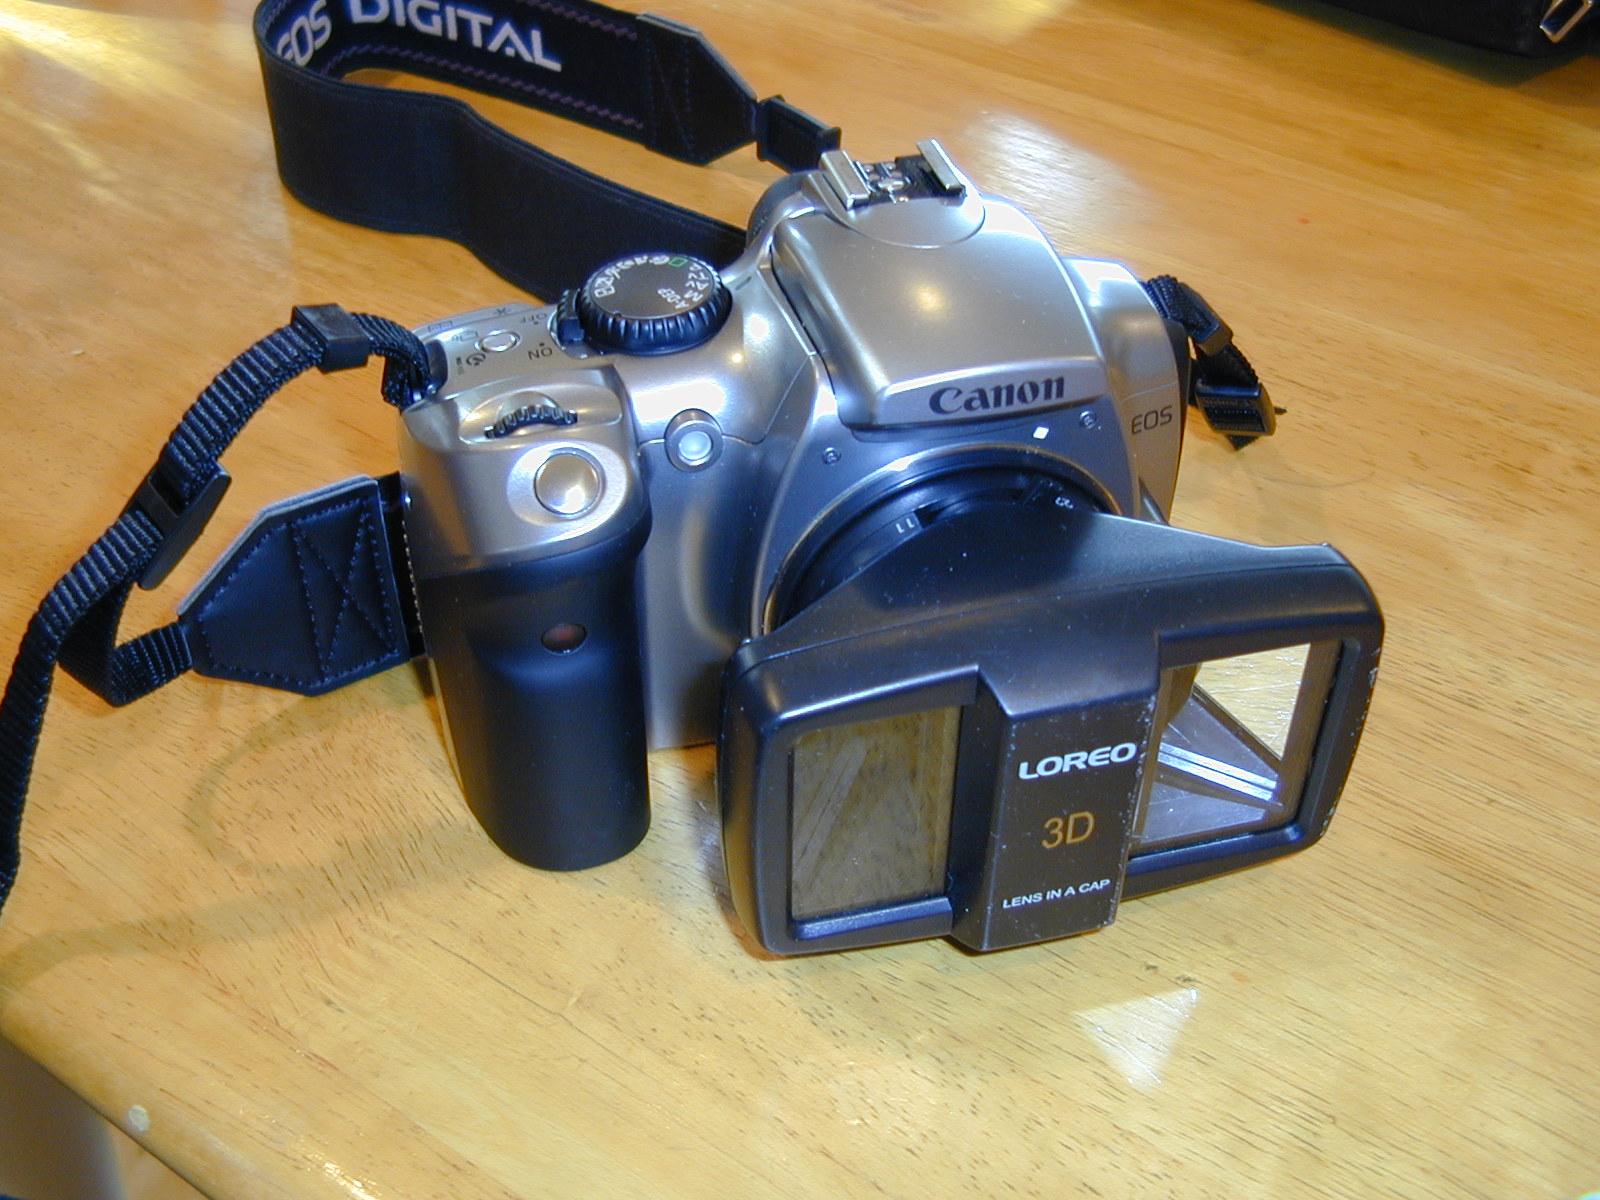 Camera 3d Dslr Camera thin blue line 3d camera camera